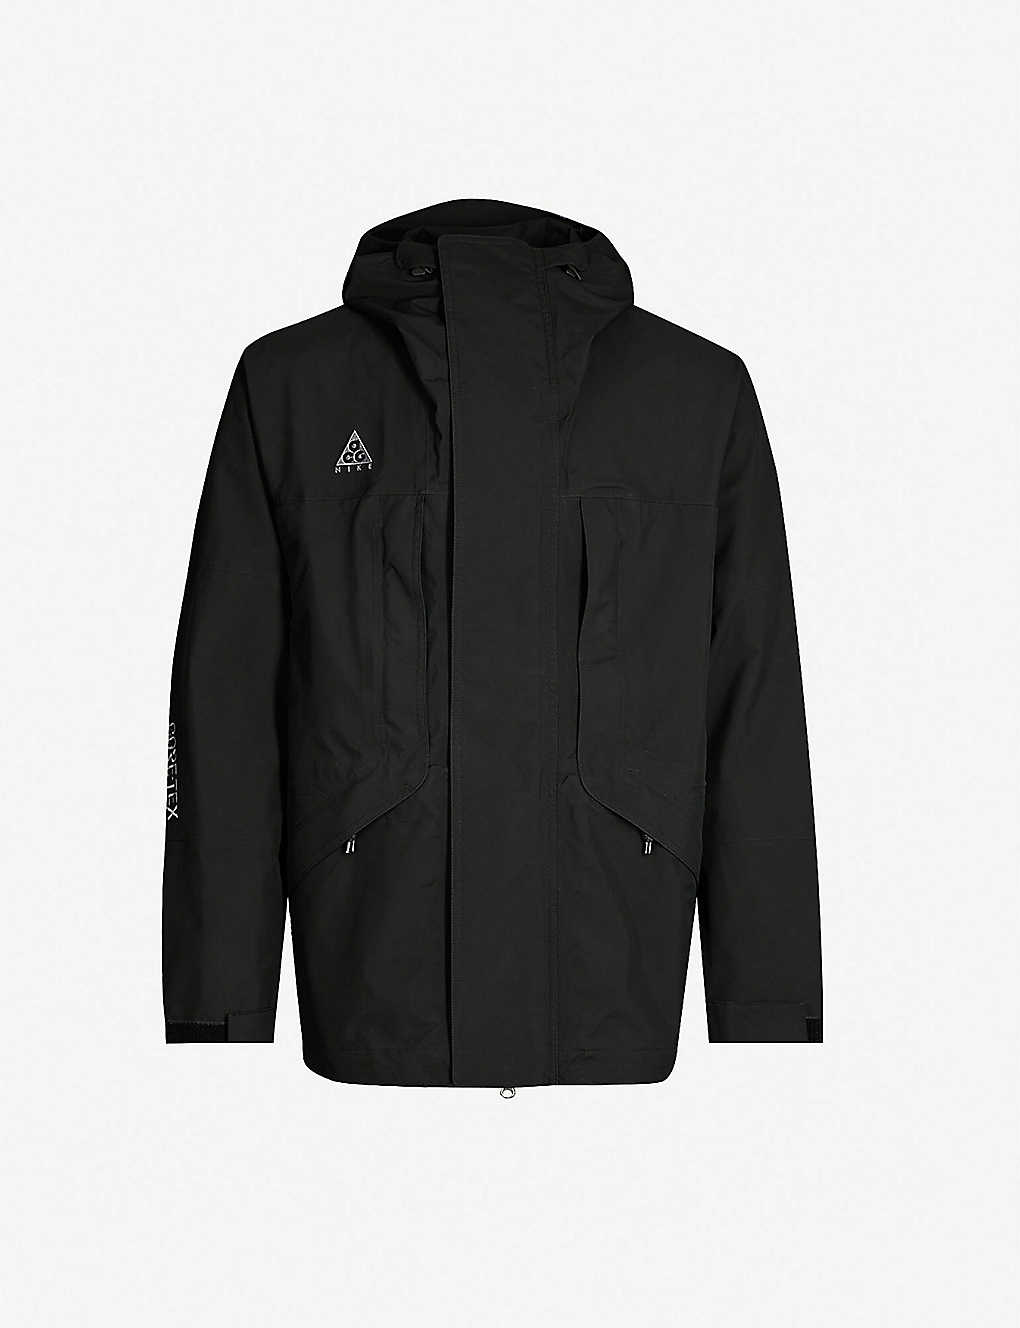 bb7c9df23750 NIKE - Nike ACG waterproof shell jacket